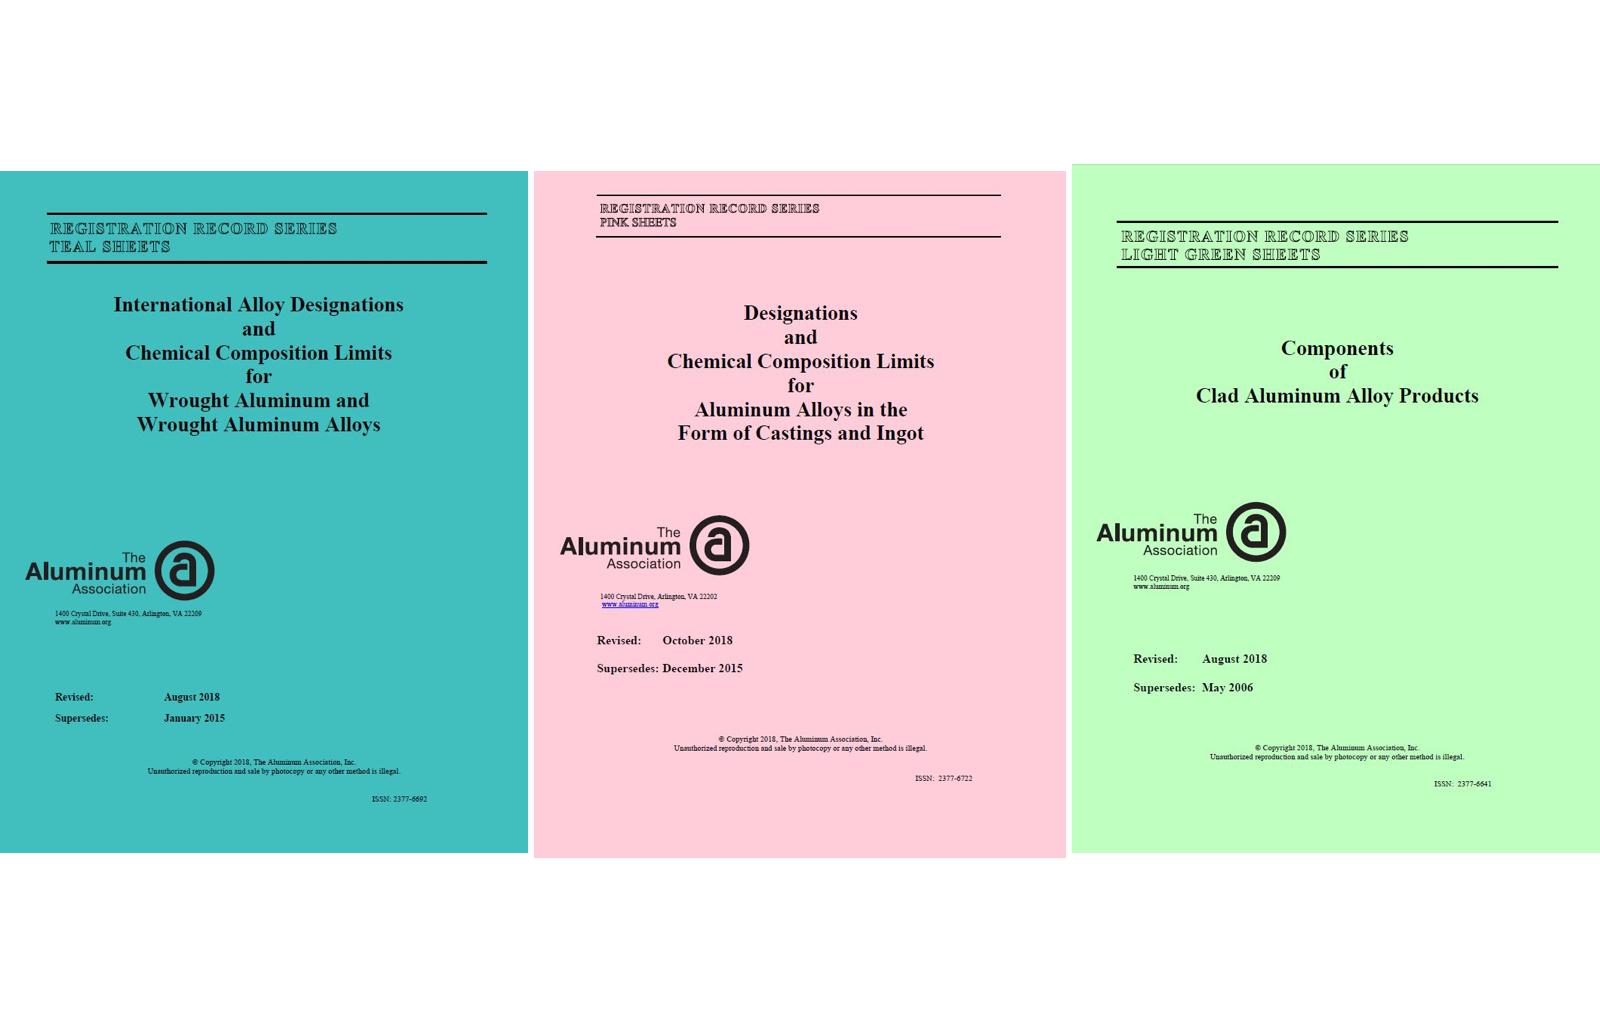 Aluminum Association Updates Registration Records – Teal, Pink and